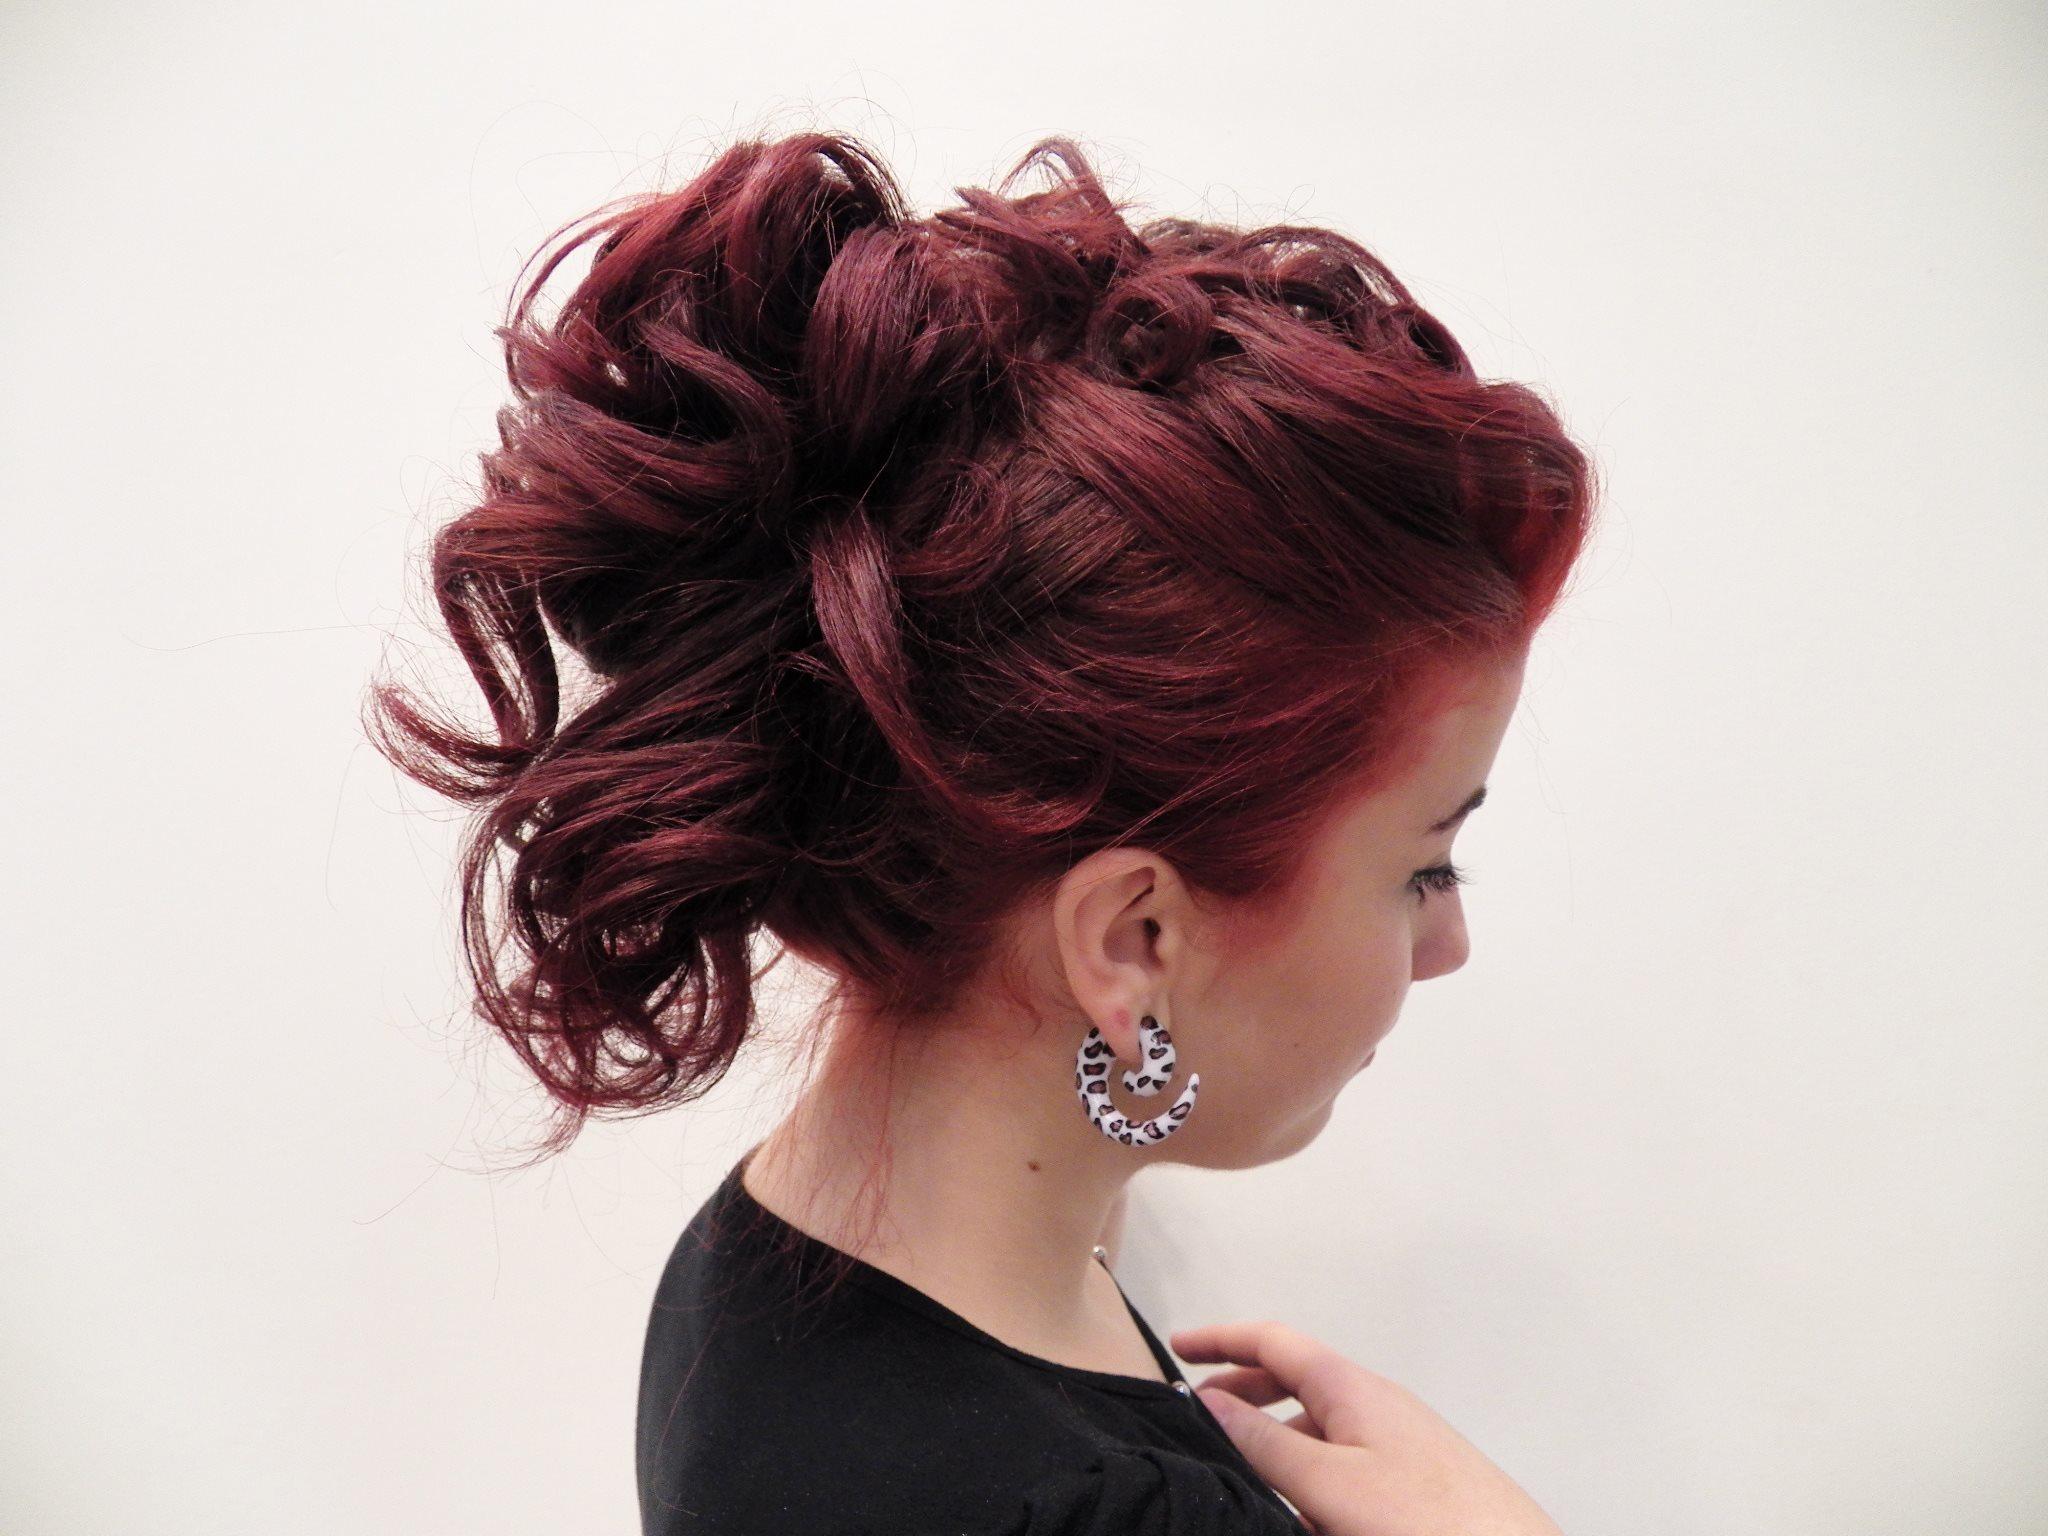 Teste Cachos cachos ruivos, coque, casamento, show cabelo  visagista consultor(a) maquiador(a)